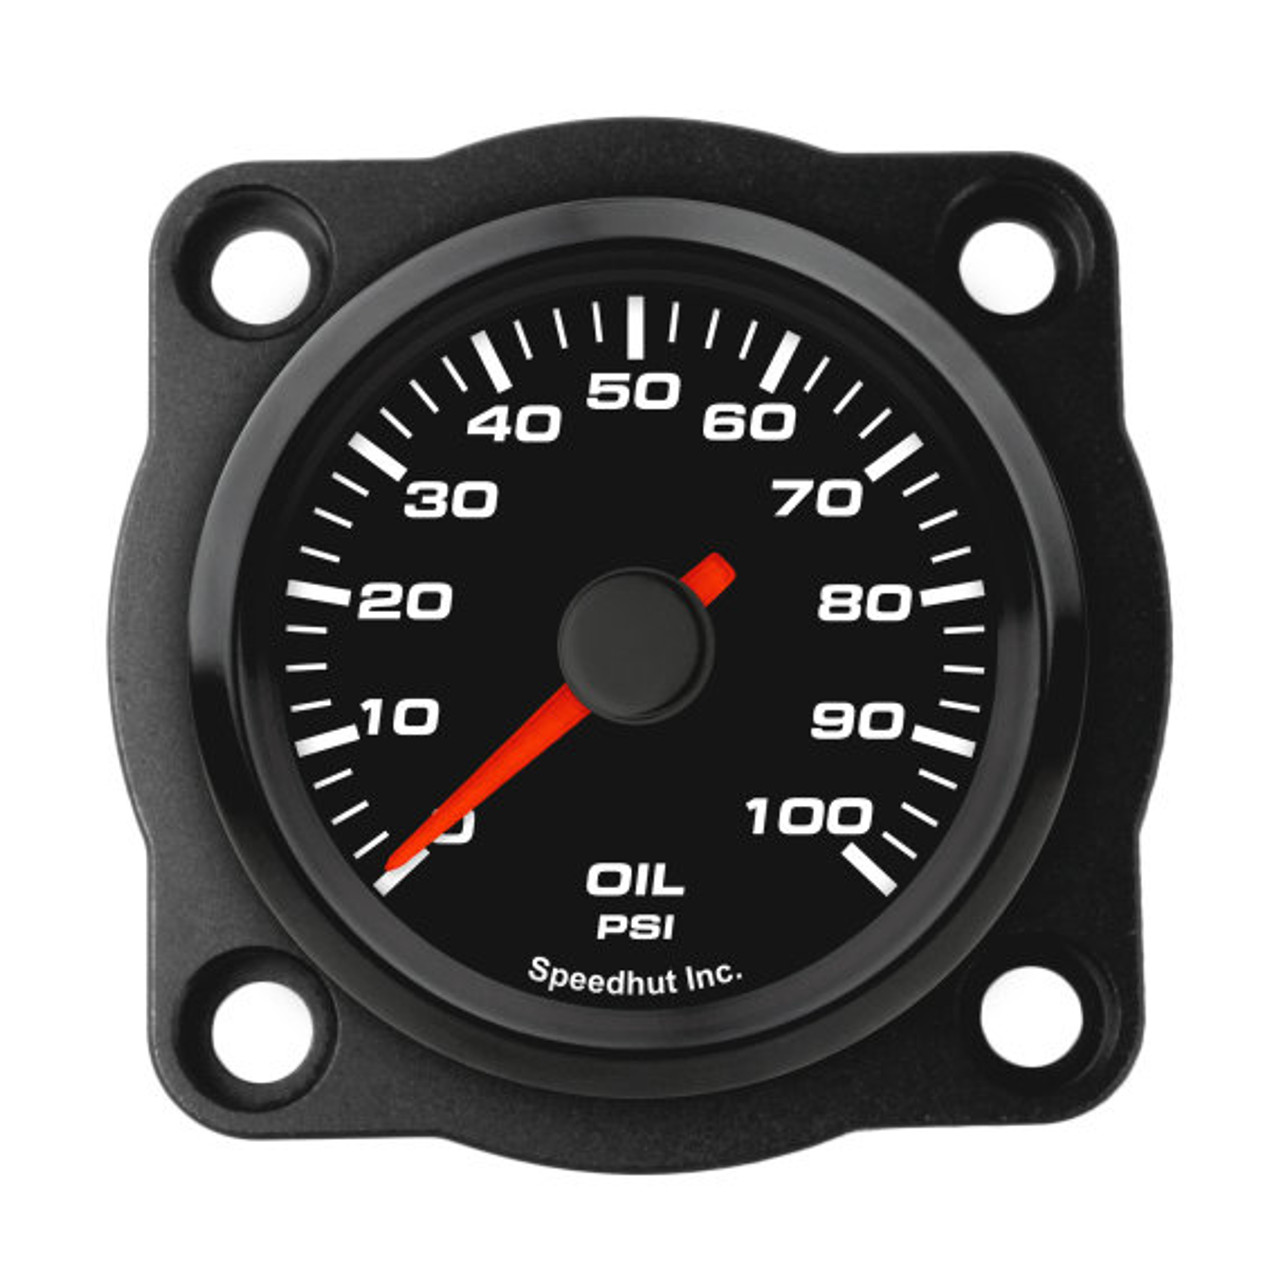 "Black Aviator Trim Bezel for 2-1/16"" gauge"